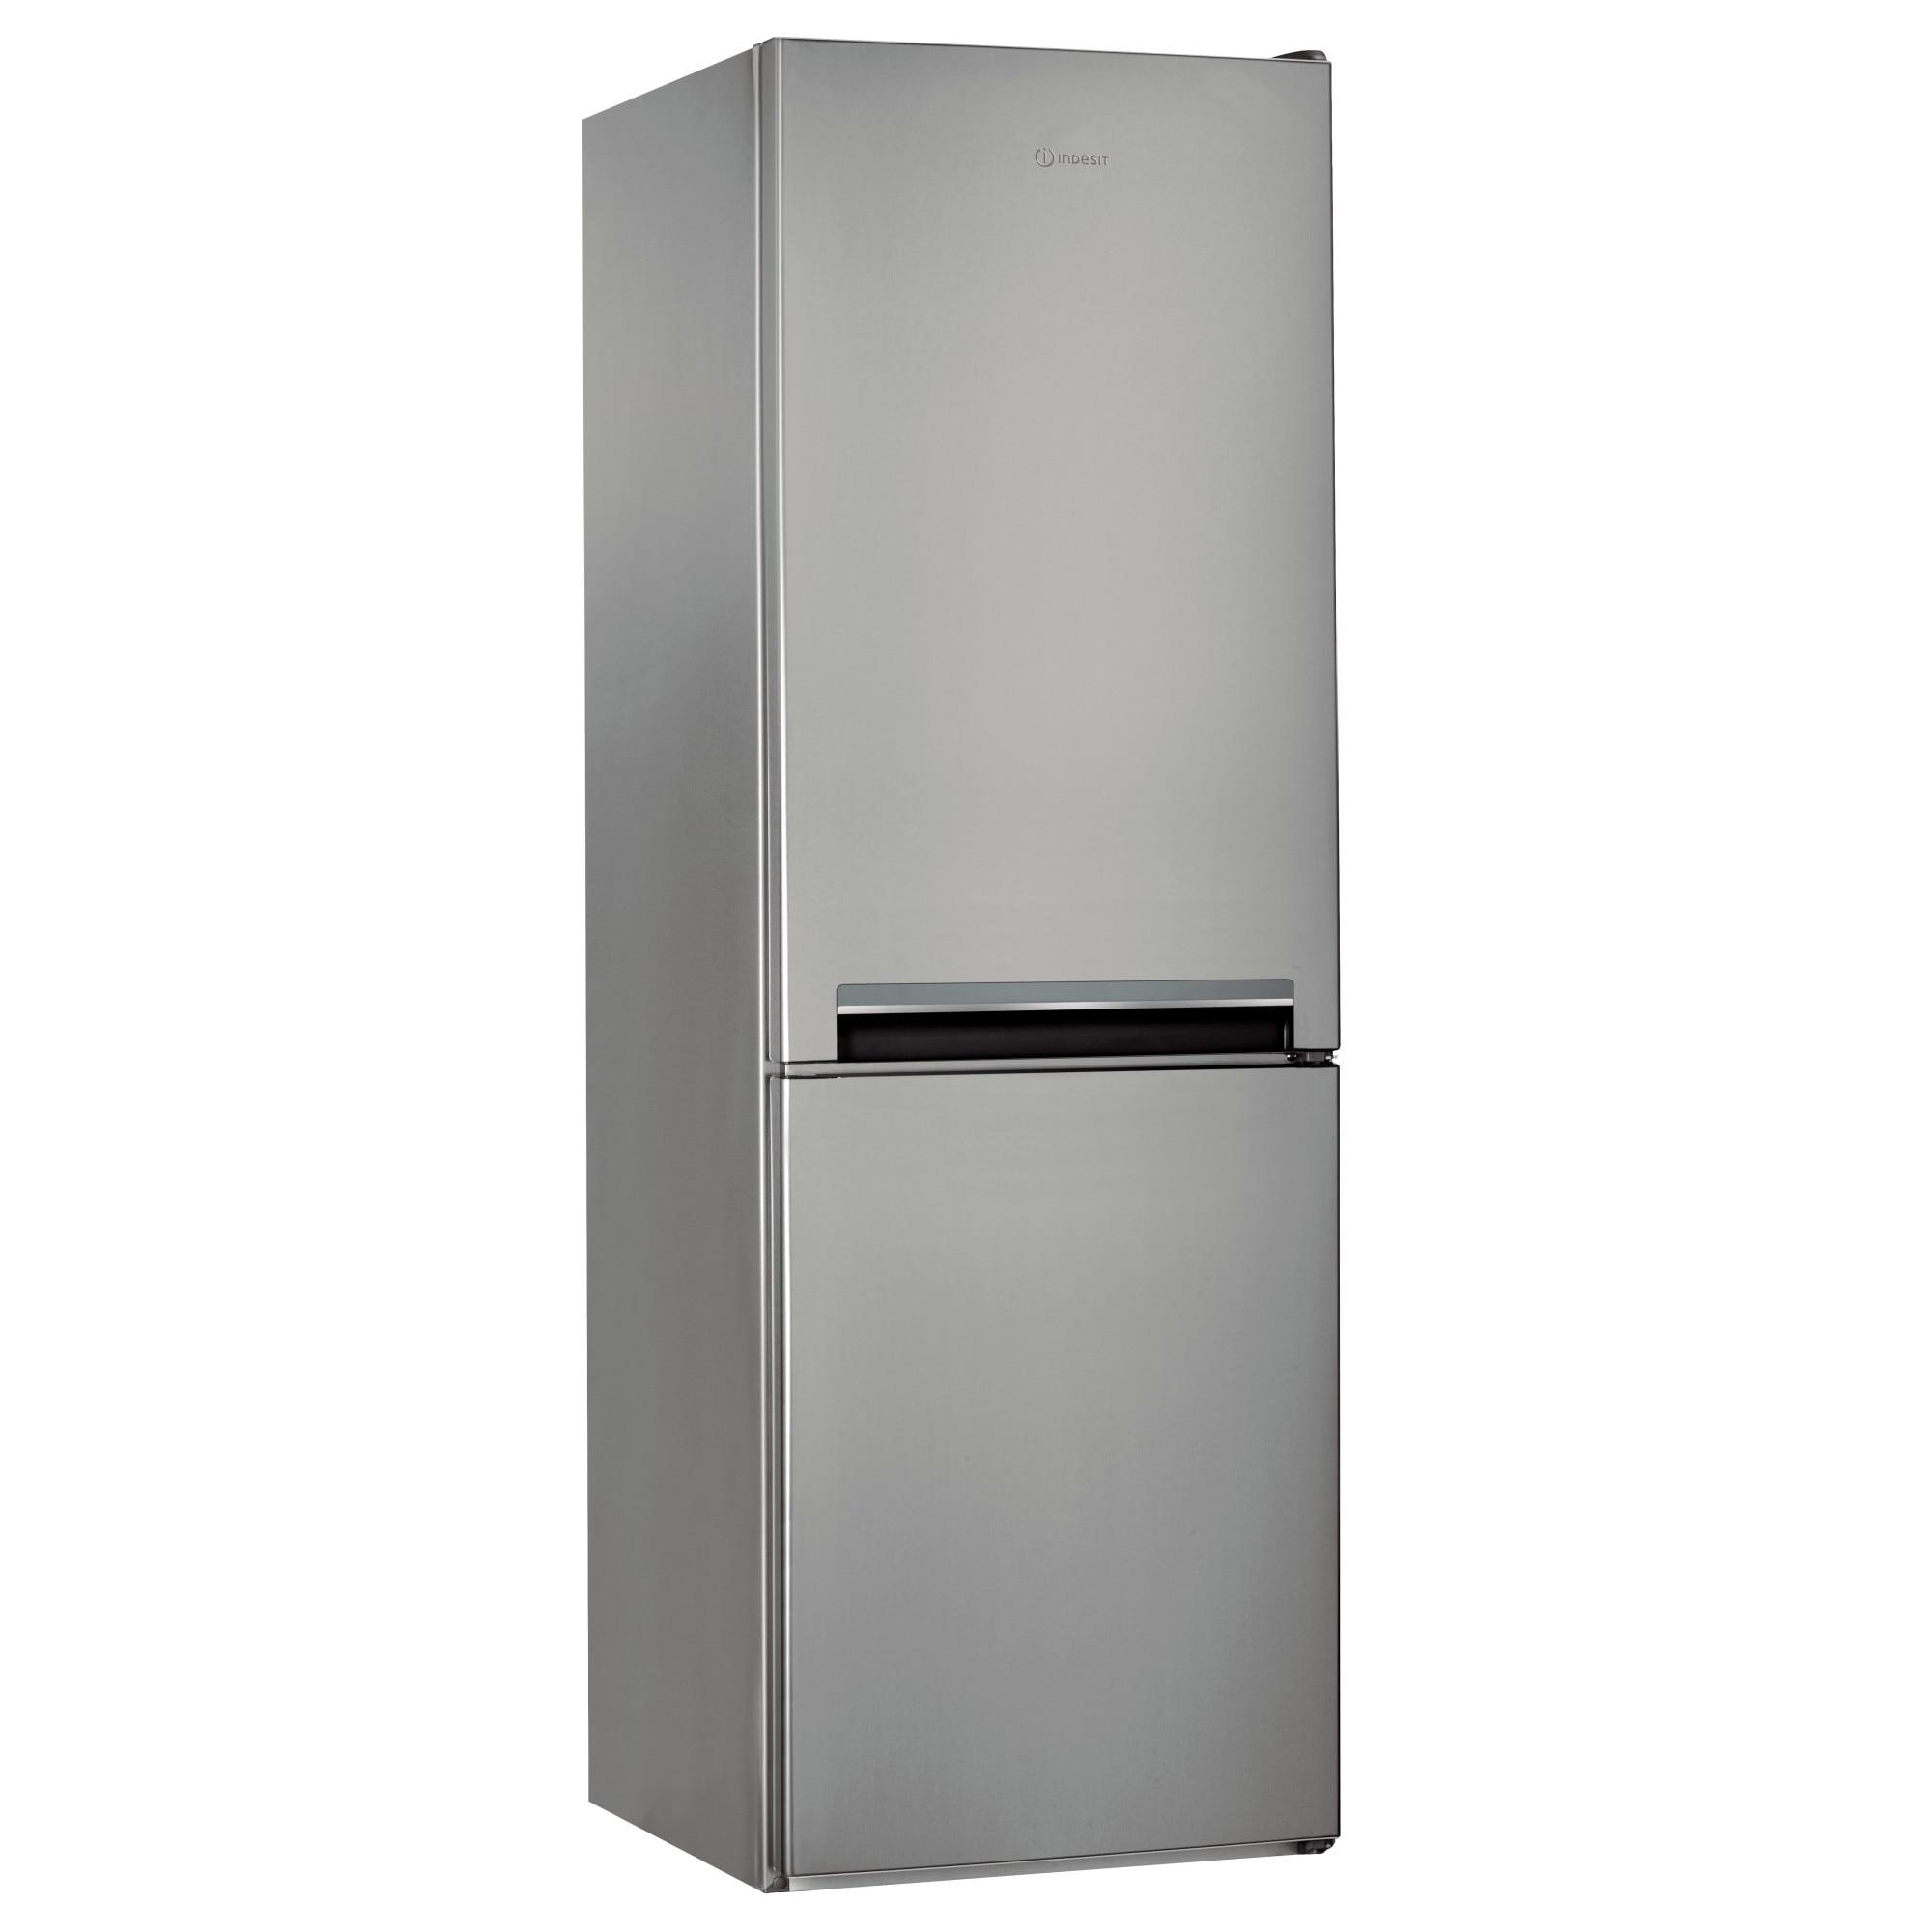 Fotografie Combina frigorifica Indesit LI7S1ES, 308 l, Clasa F, Fast cooling, Less frost, Fresh box, H 176 cm, Argintiu